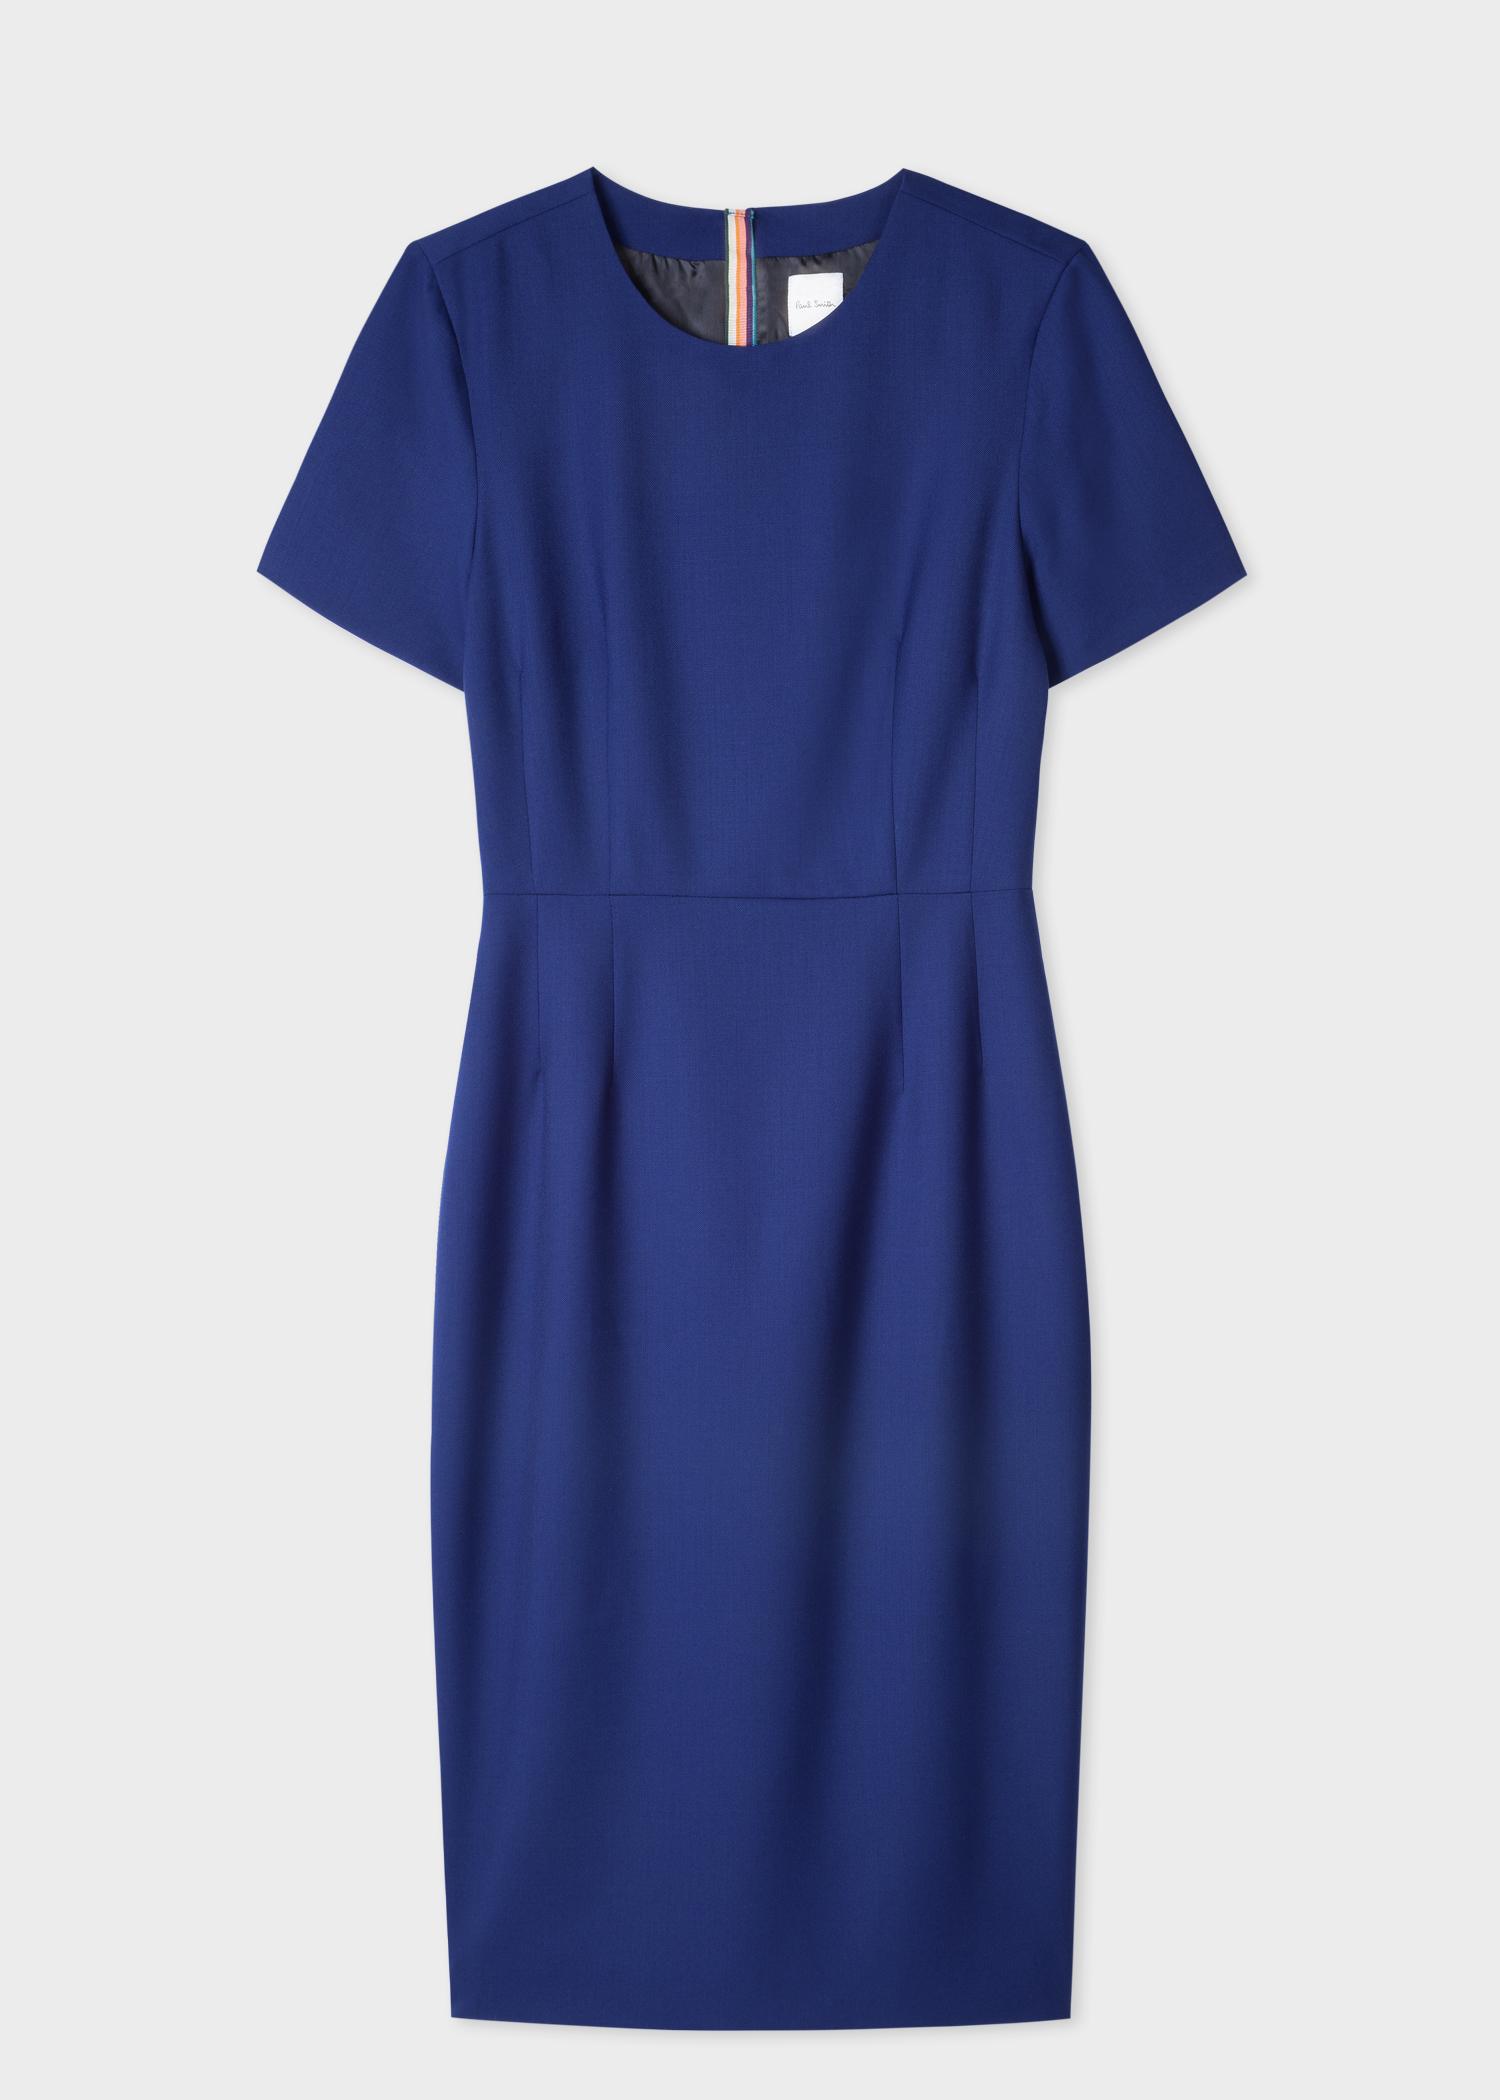 33732c7c045 Robe Femme Bleue  A Dress To Travel In  En Twill De Laine - Paul ...